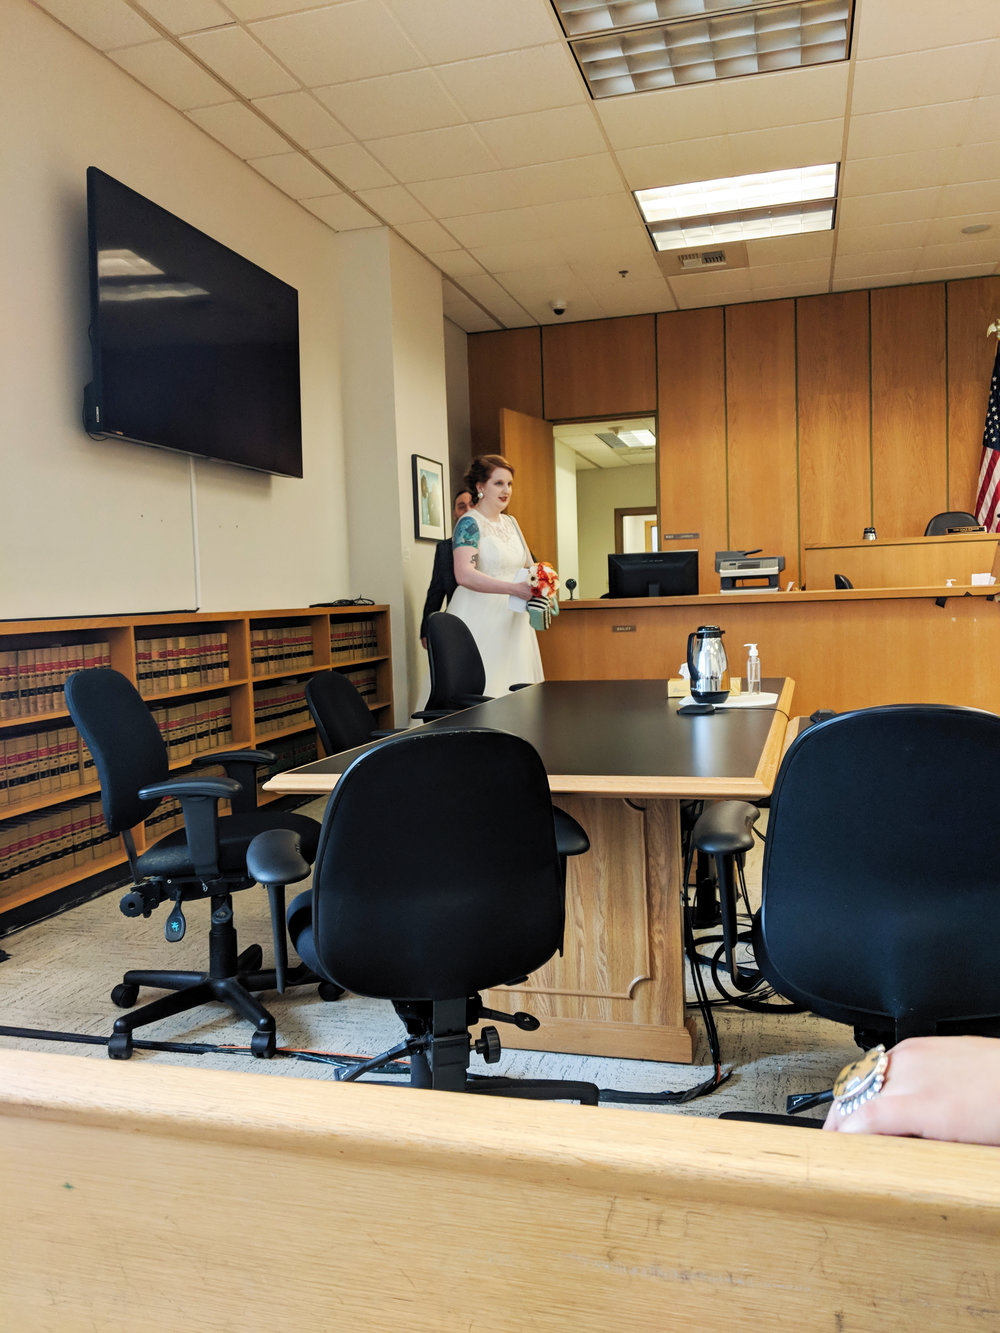 Courthouse-19.jpg